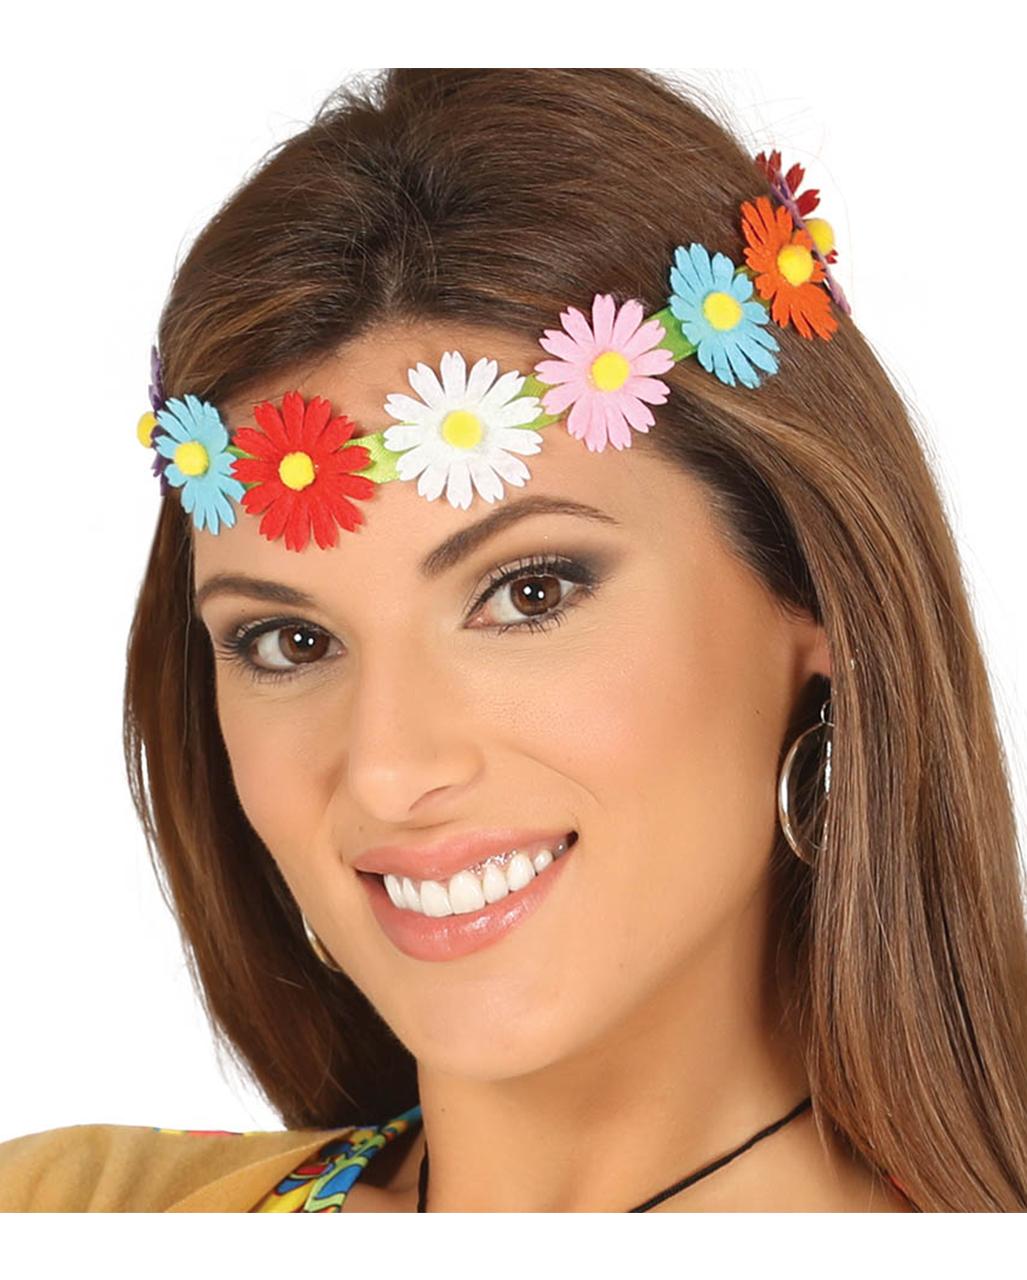 Colorful Hippie Flower Headband For Carnival Horror Shopcom